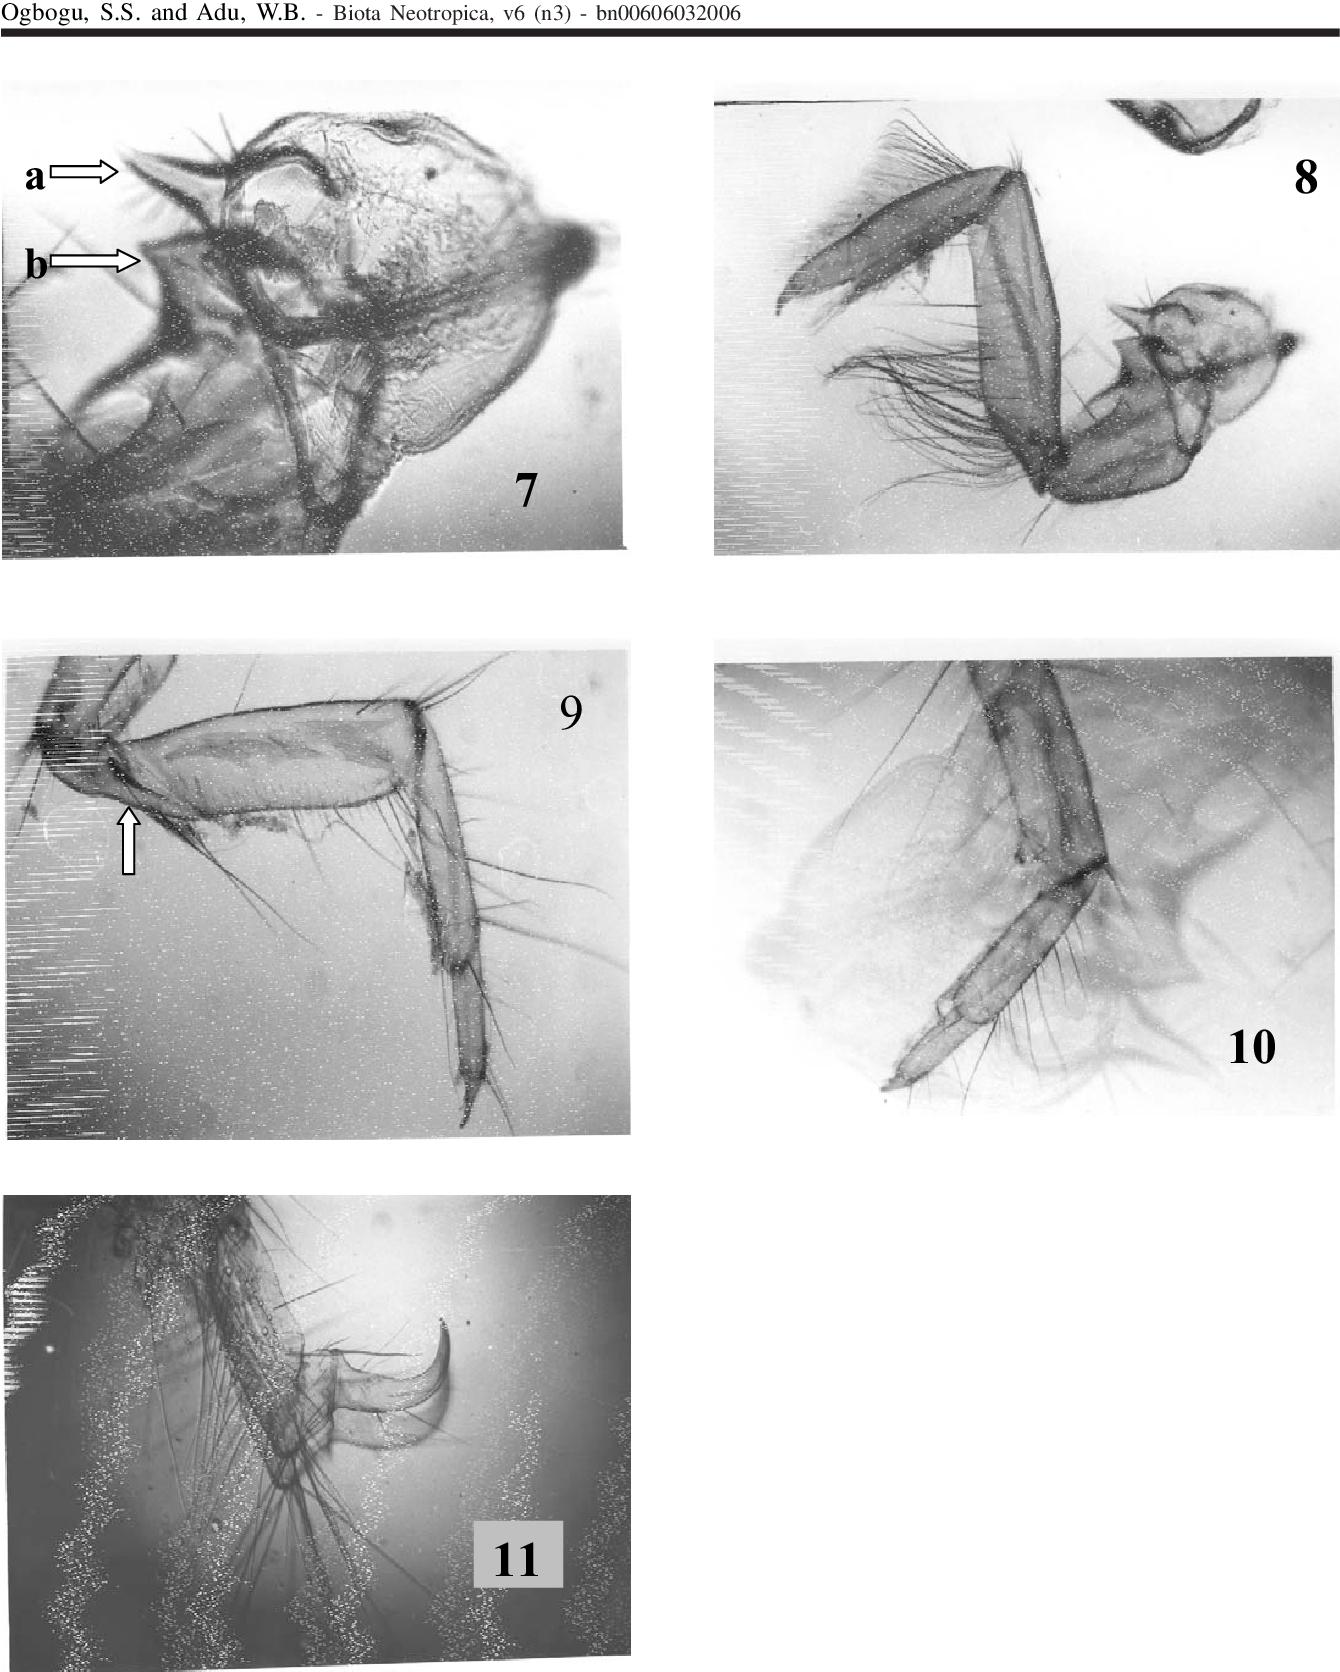 figure 7-11